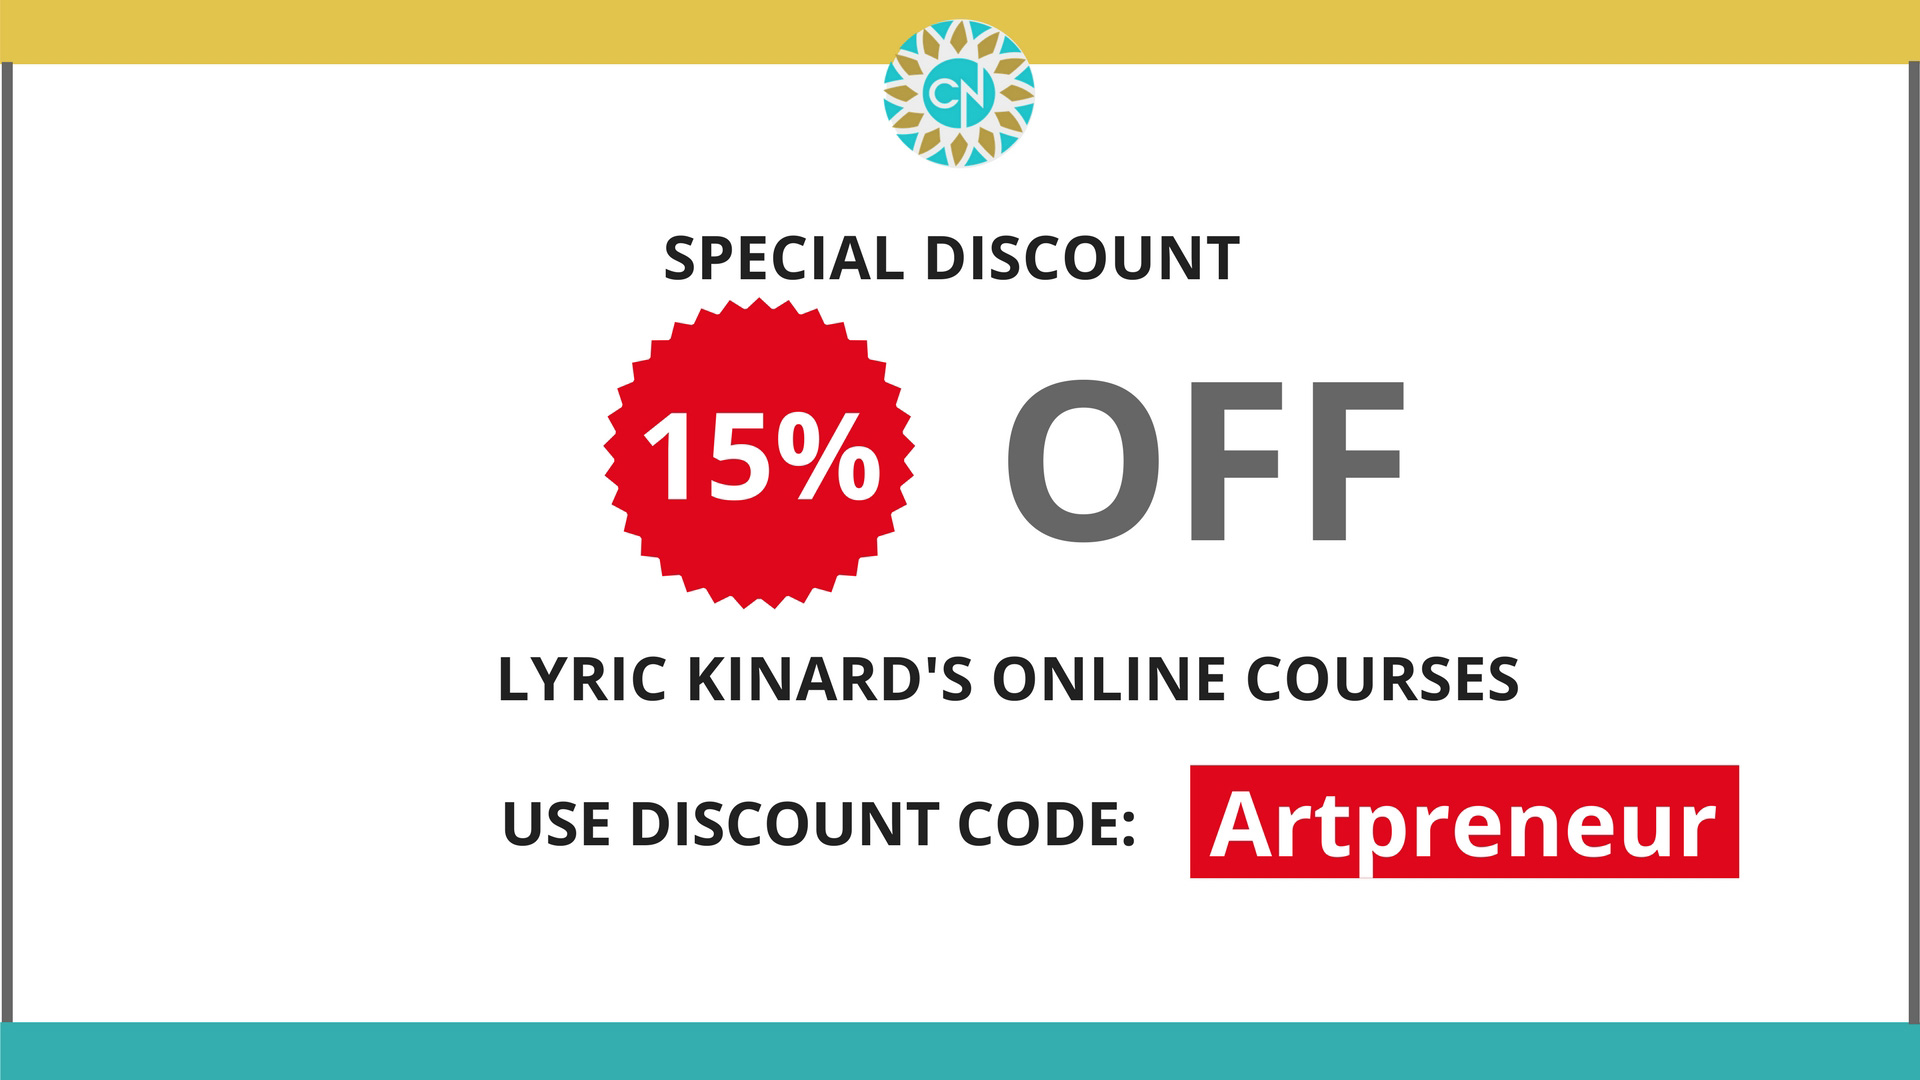 Lyric Kinard's Discount on her Online Courses